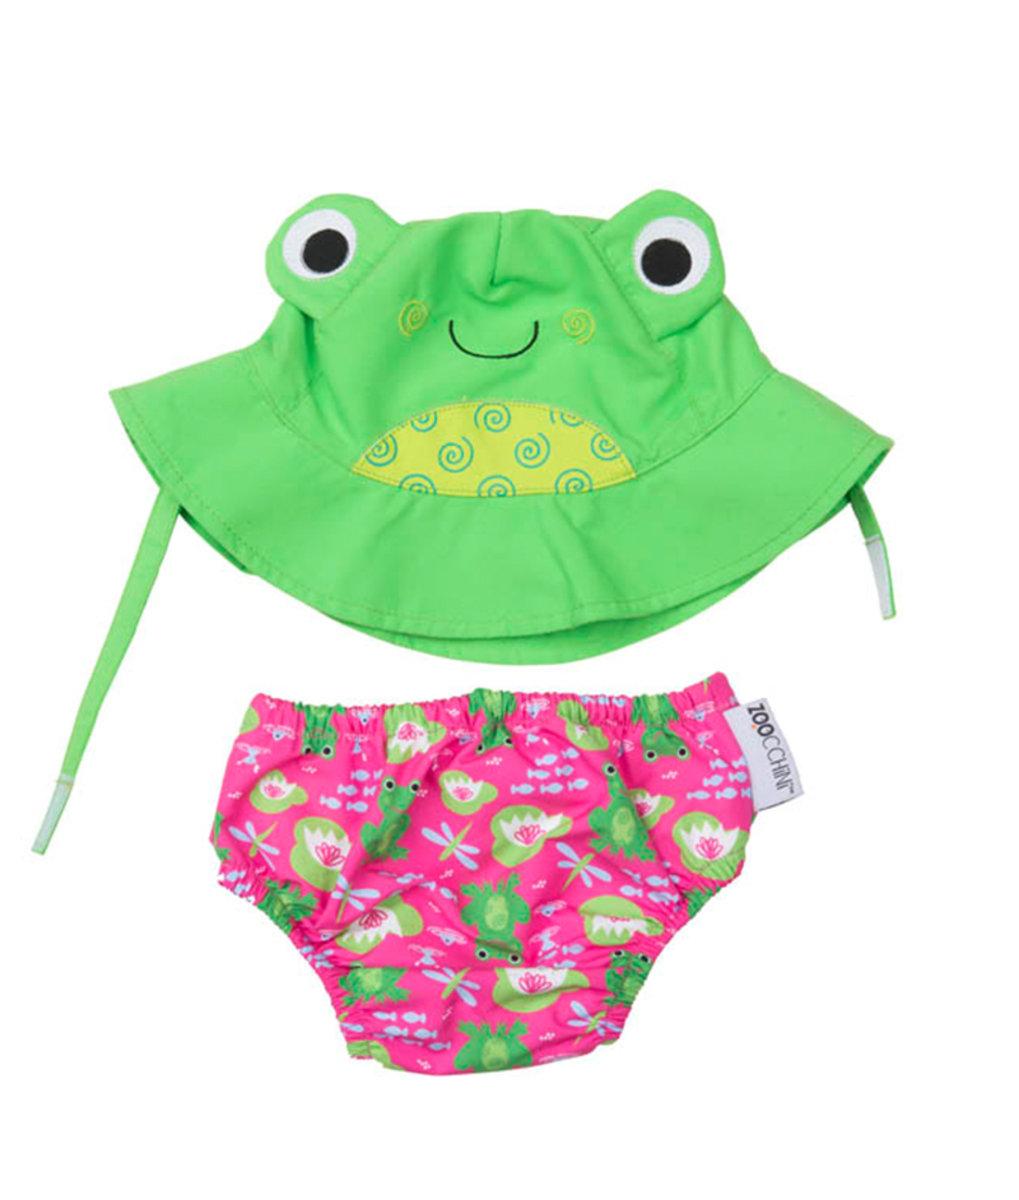 Zoocchini Baby Swim Diaper Sun Hat Set Frog 12 Buy 2 Get 20 Chicco Nail Scissors Pink Massage Oil